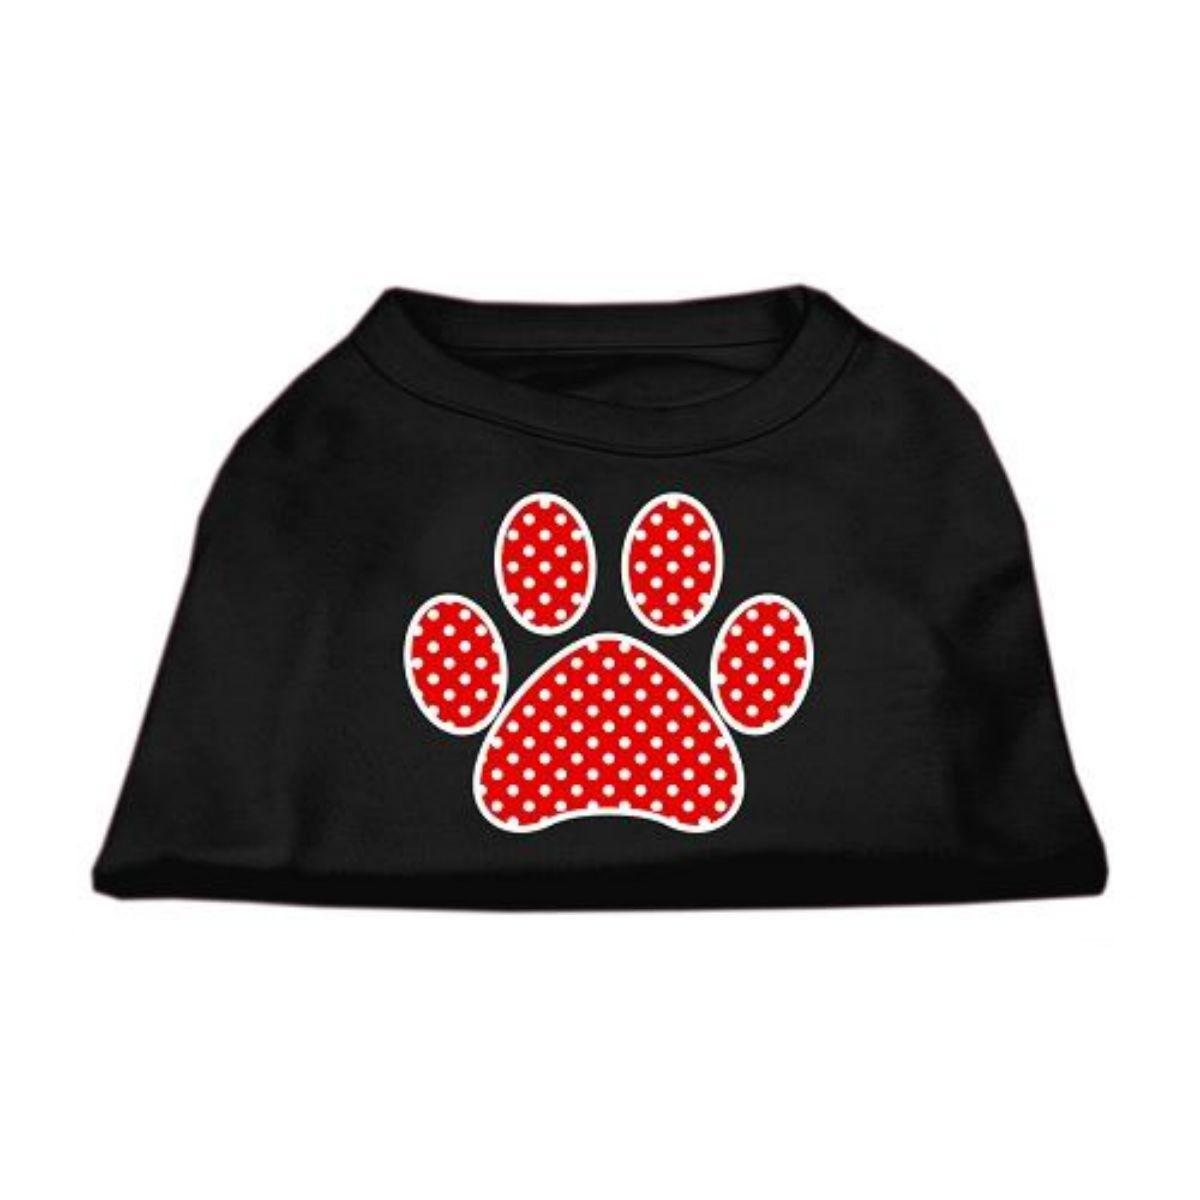 Red Swiss Dot Paw Dog Shirt - Black